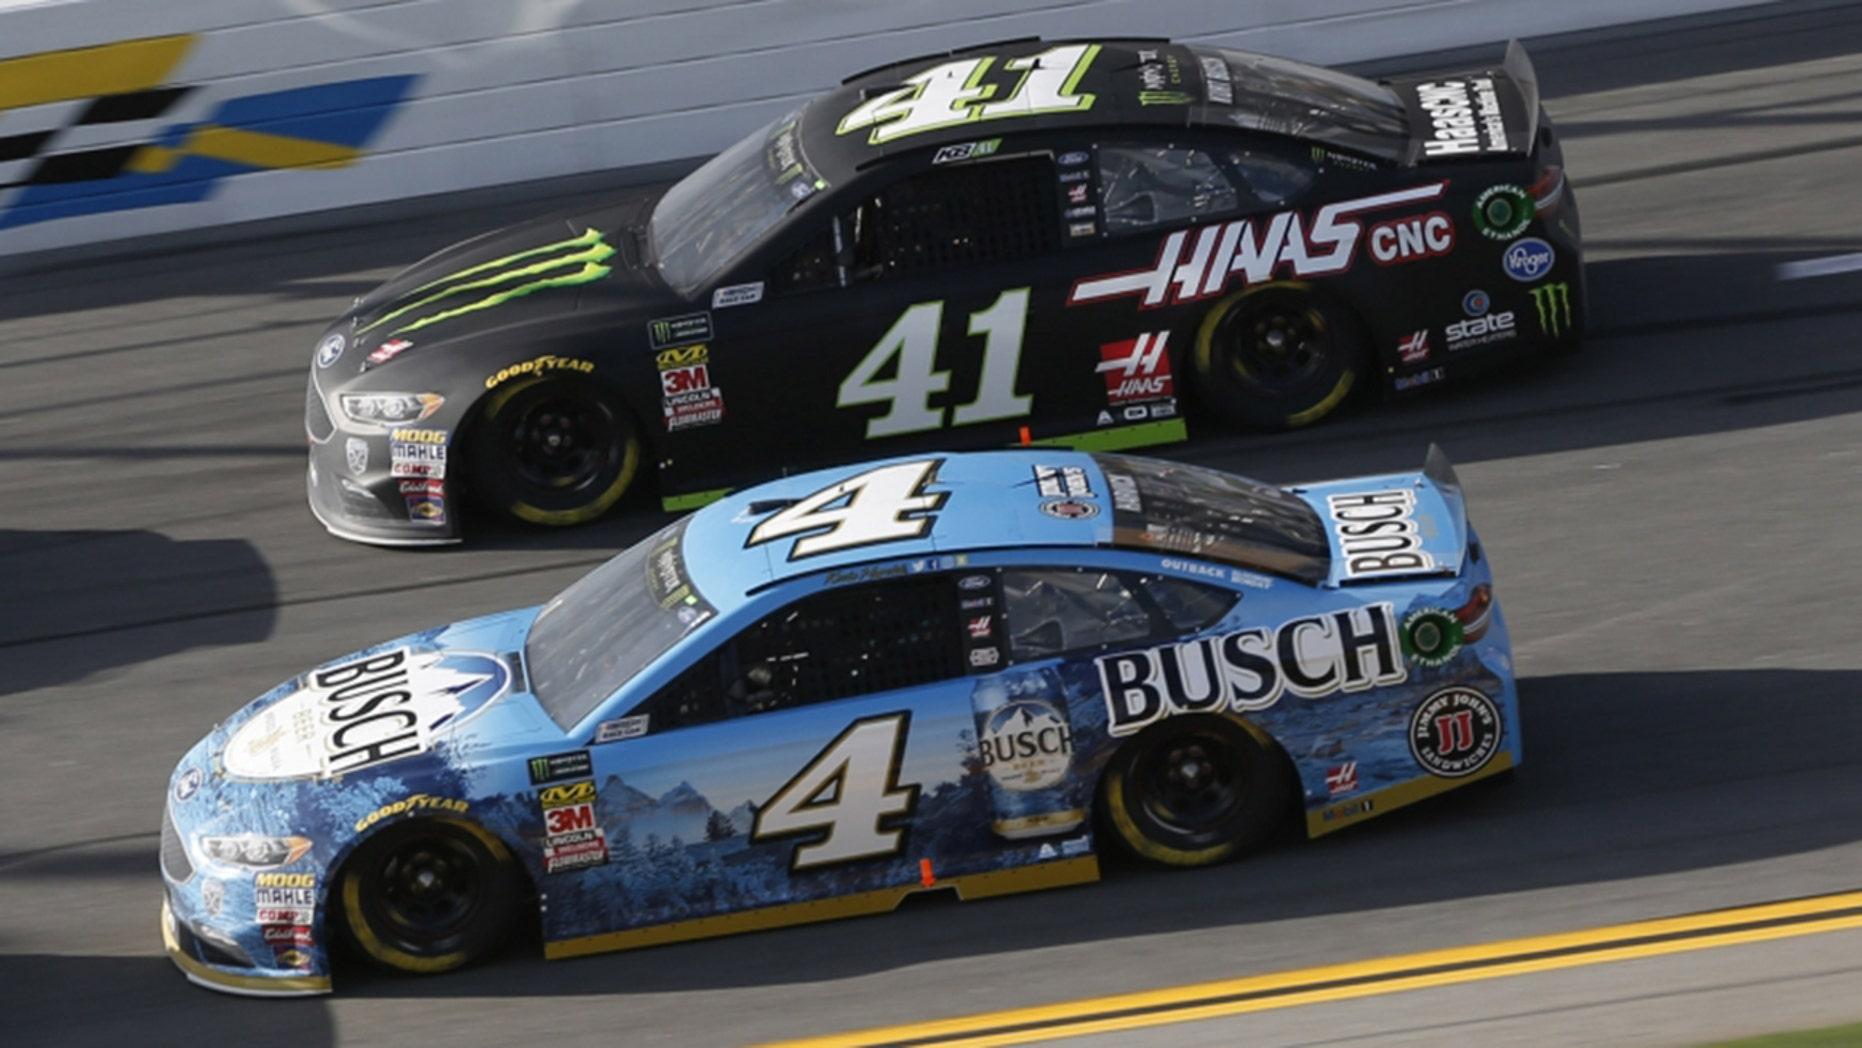 Kevin Harvick (4) battles Stewart-Haas teammate Kurt Busch in the Advance Auto Parts Clash